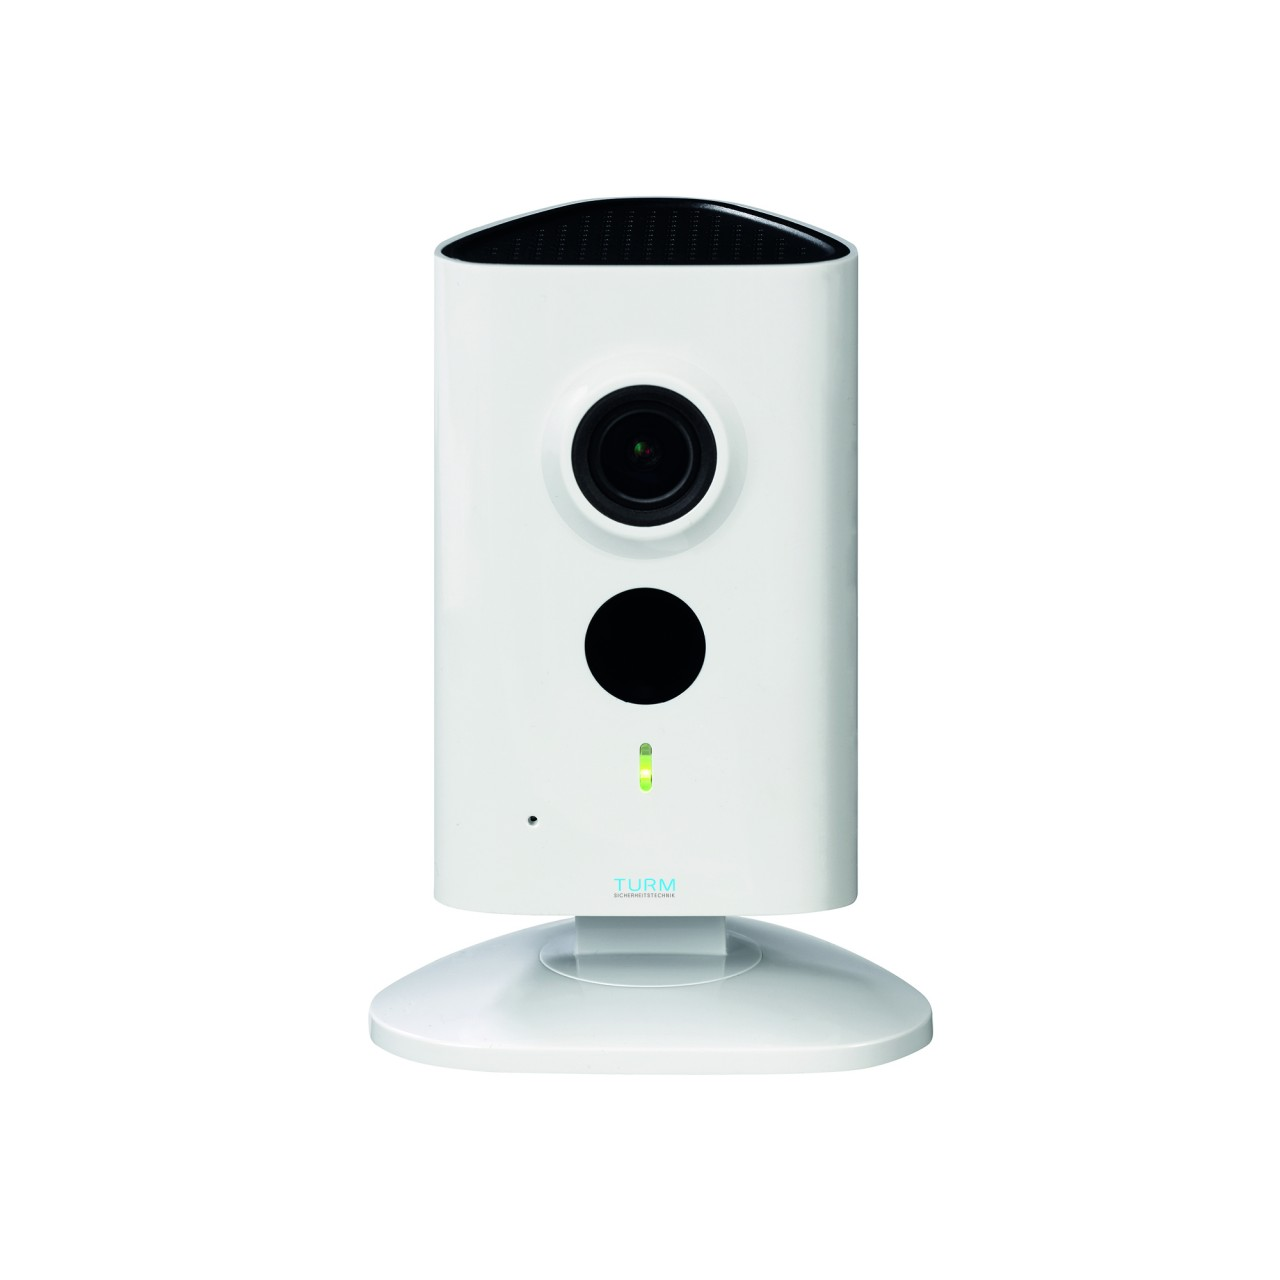 TURM WLAN Smart Home 3 MP IP Kamera mit 120° Weitwinkel und Intercom